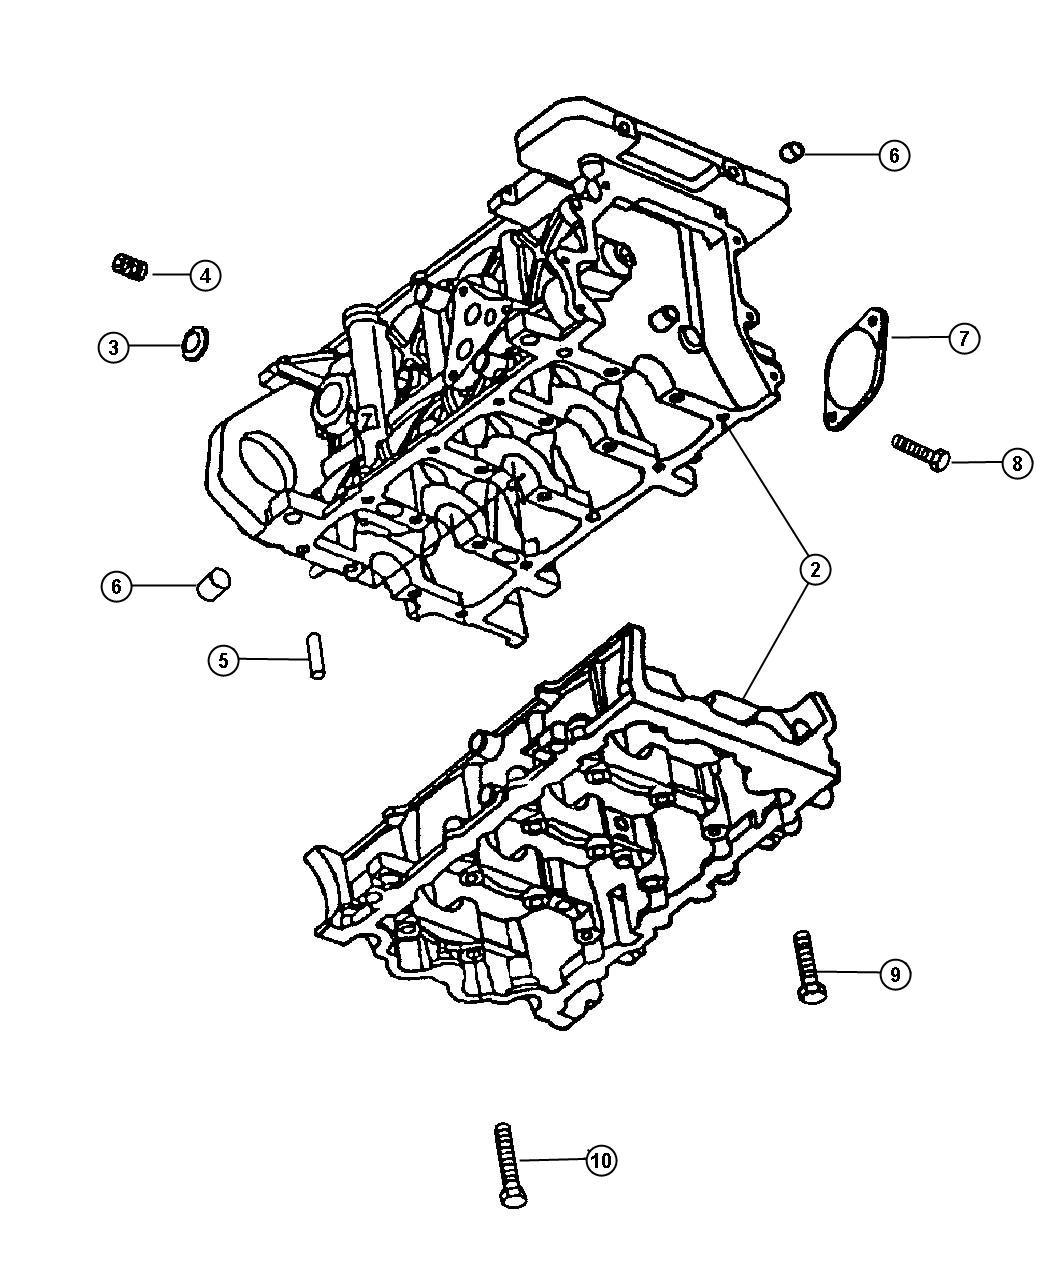 1997 Dodge Intrepid Bolt  Hex Head  M10x1 50x75  C  Member